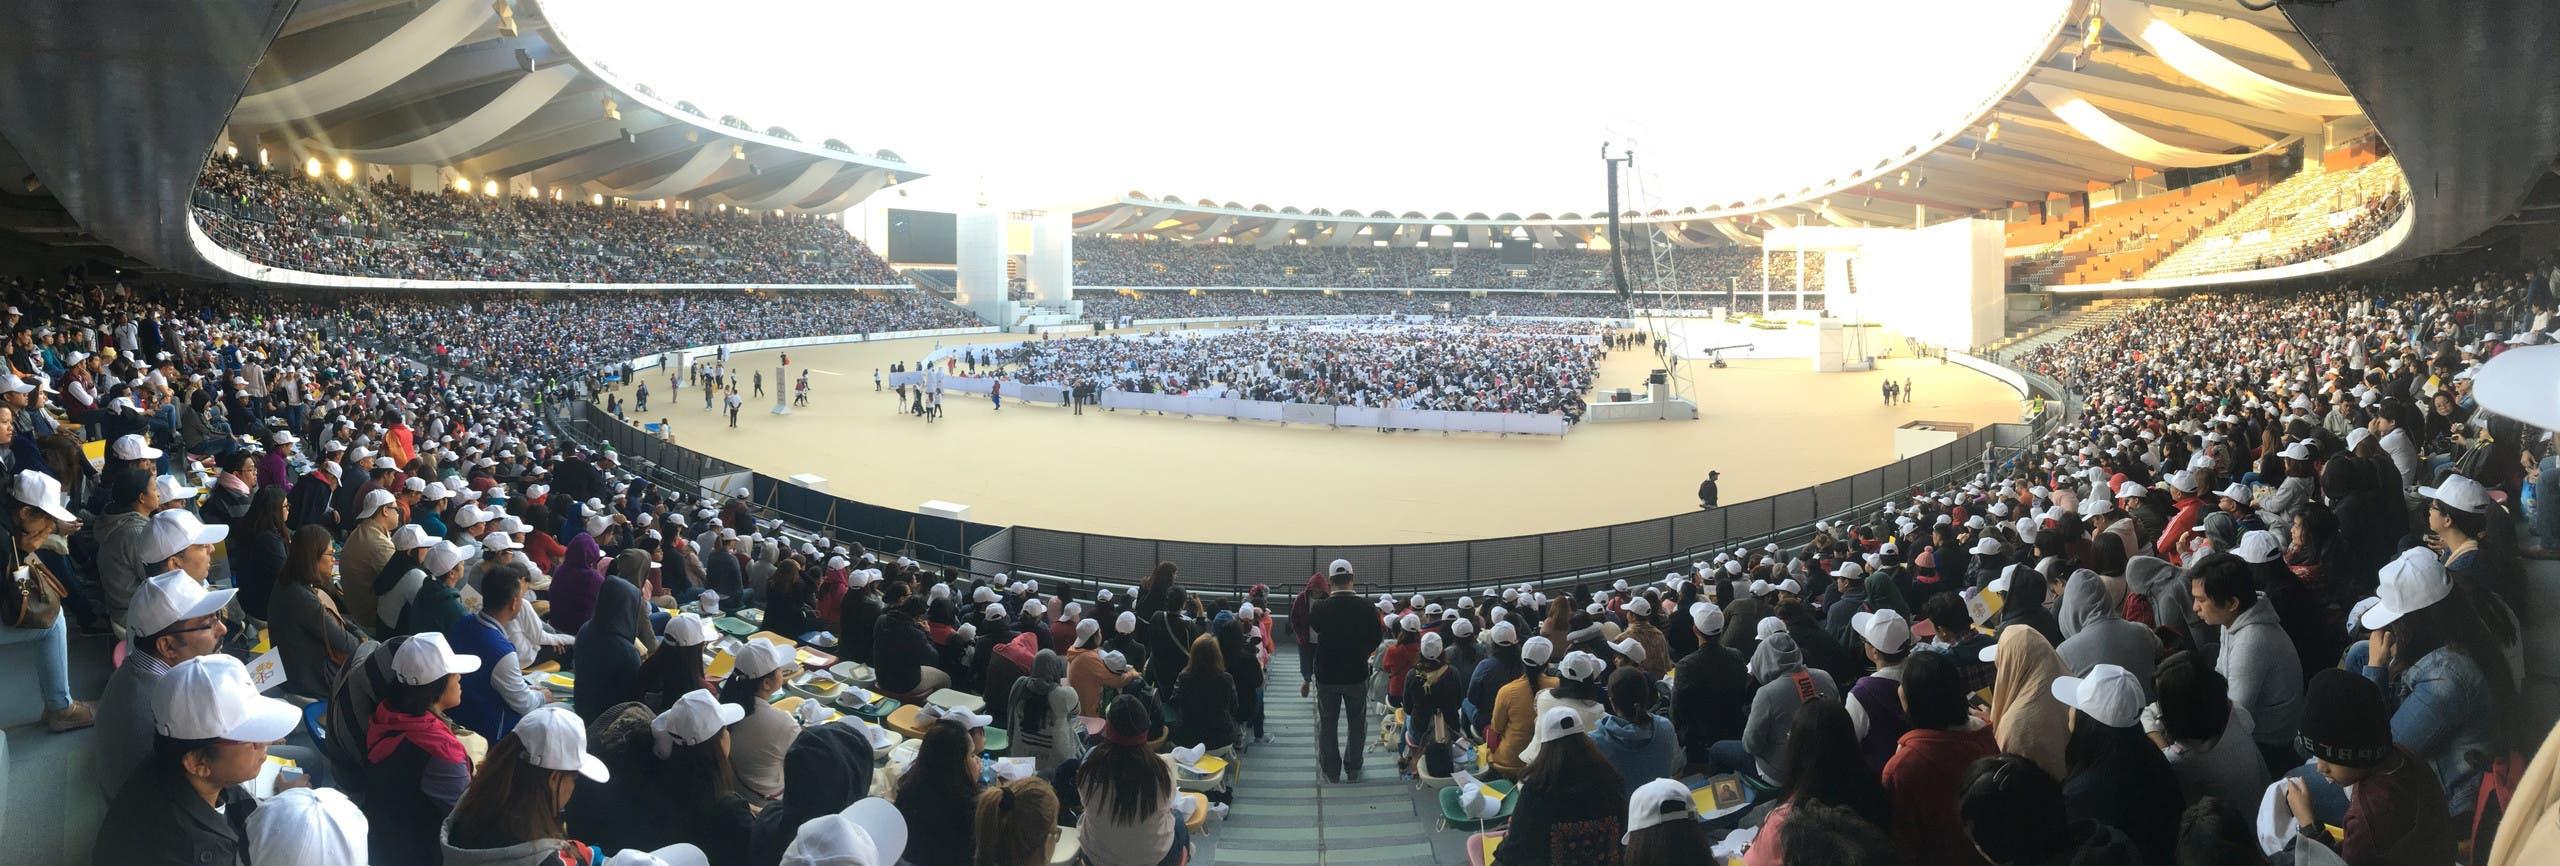 Panorama Pope's Mass. (Al Arabiya)